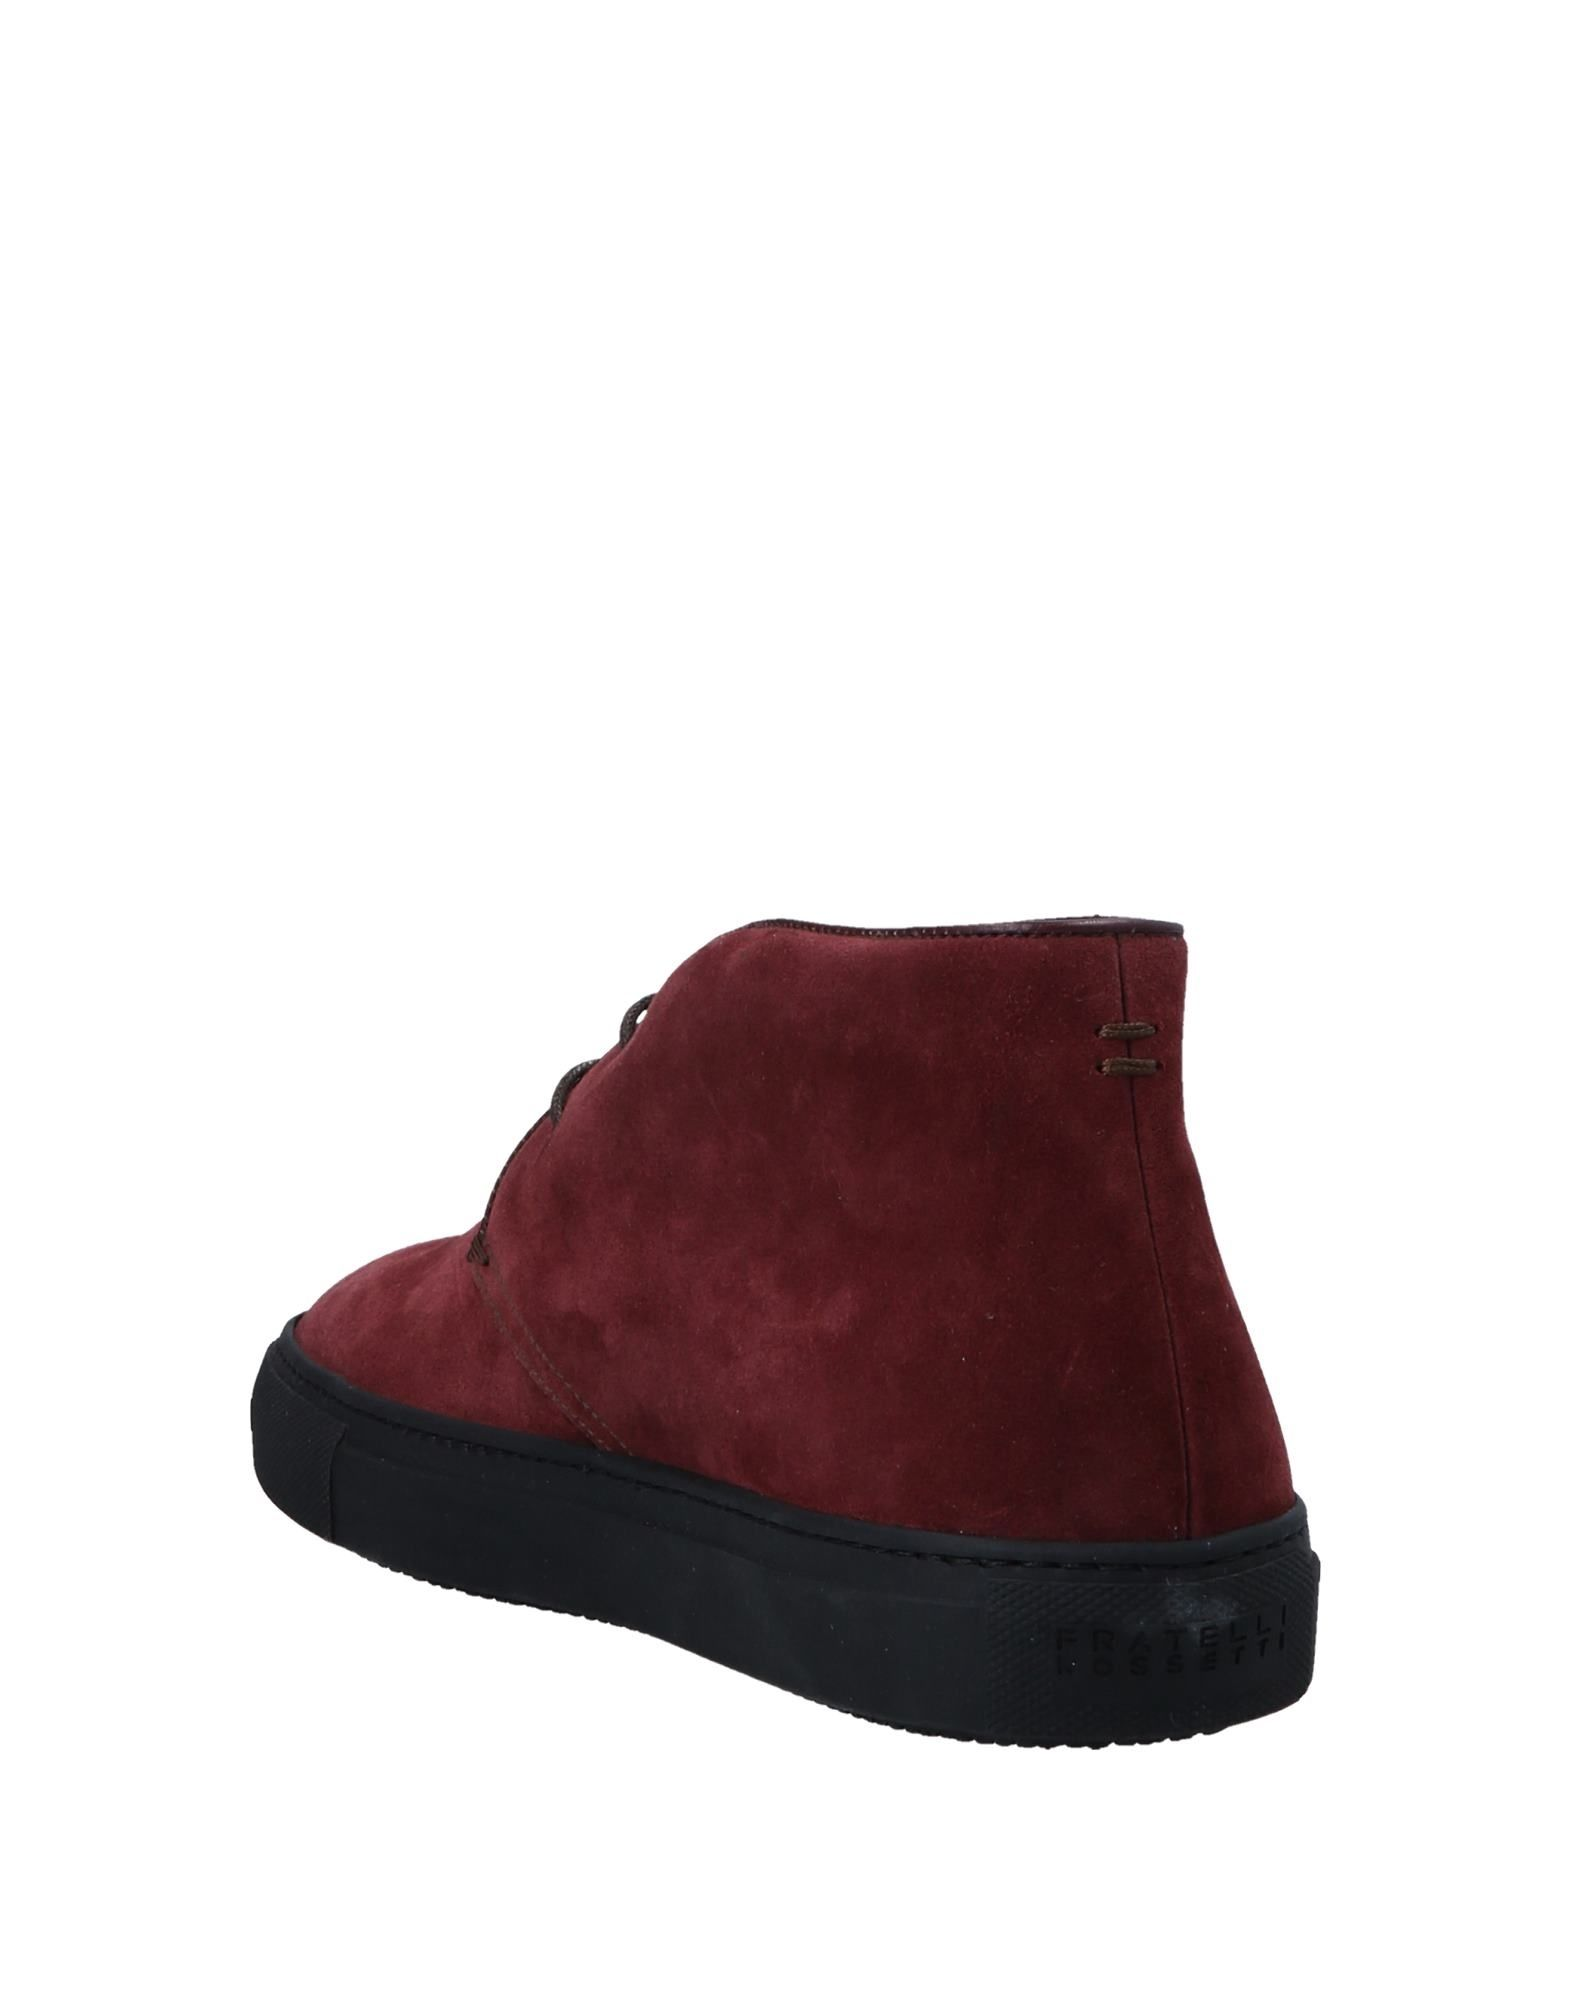 Fratelli Rossetti Stiefelette Herren  11550240UA Gute Qualität beliebte Schuhe